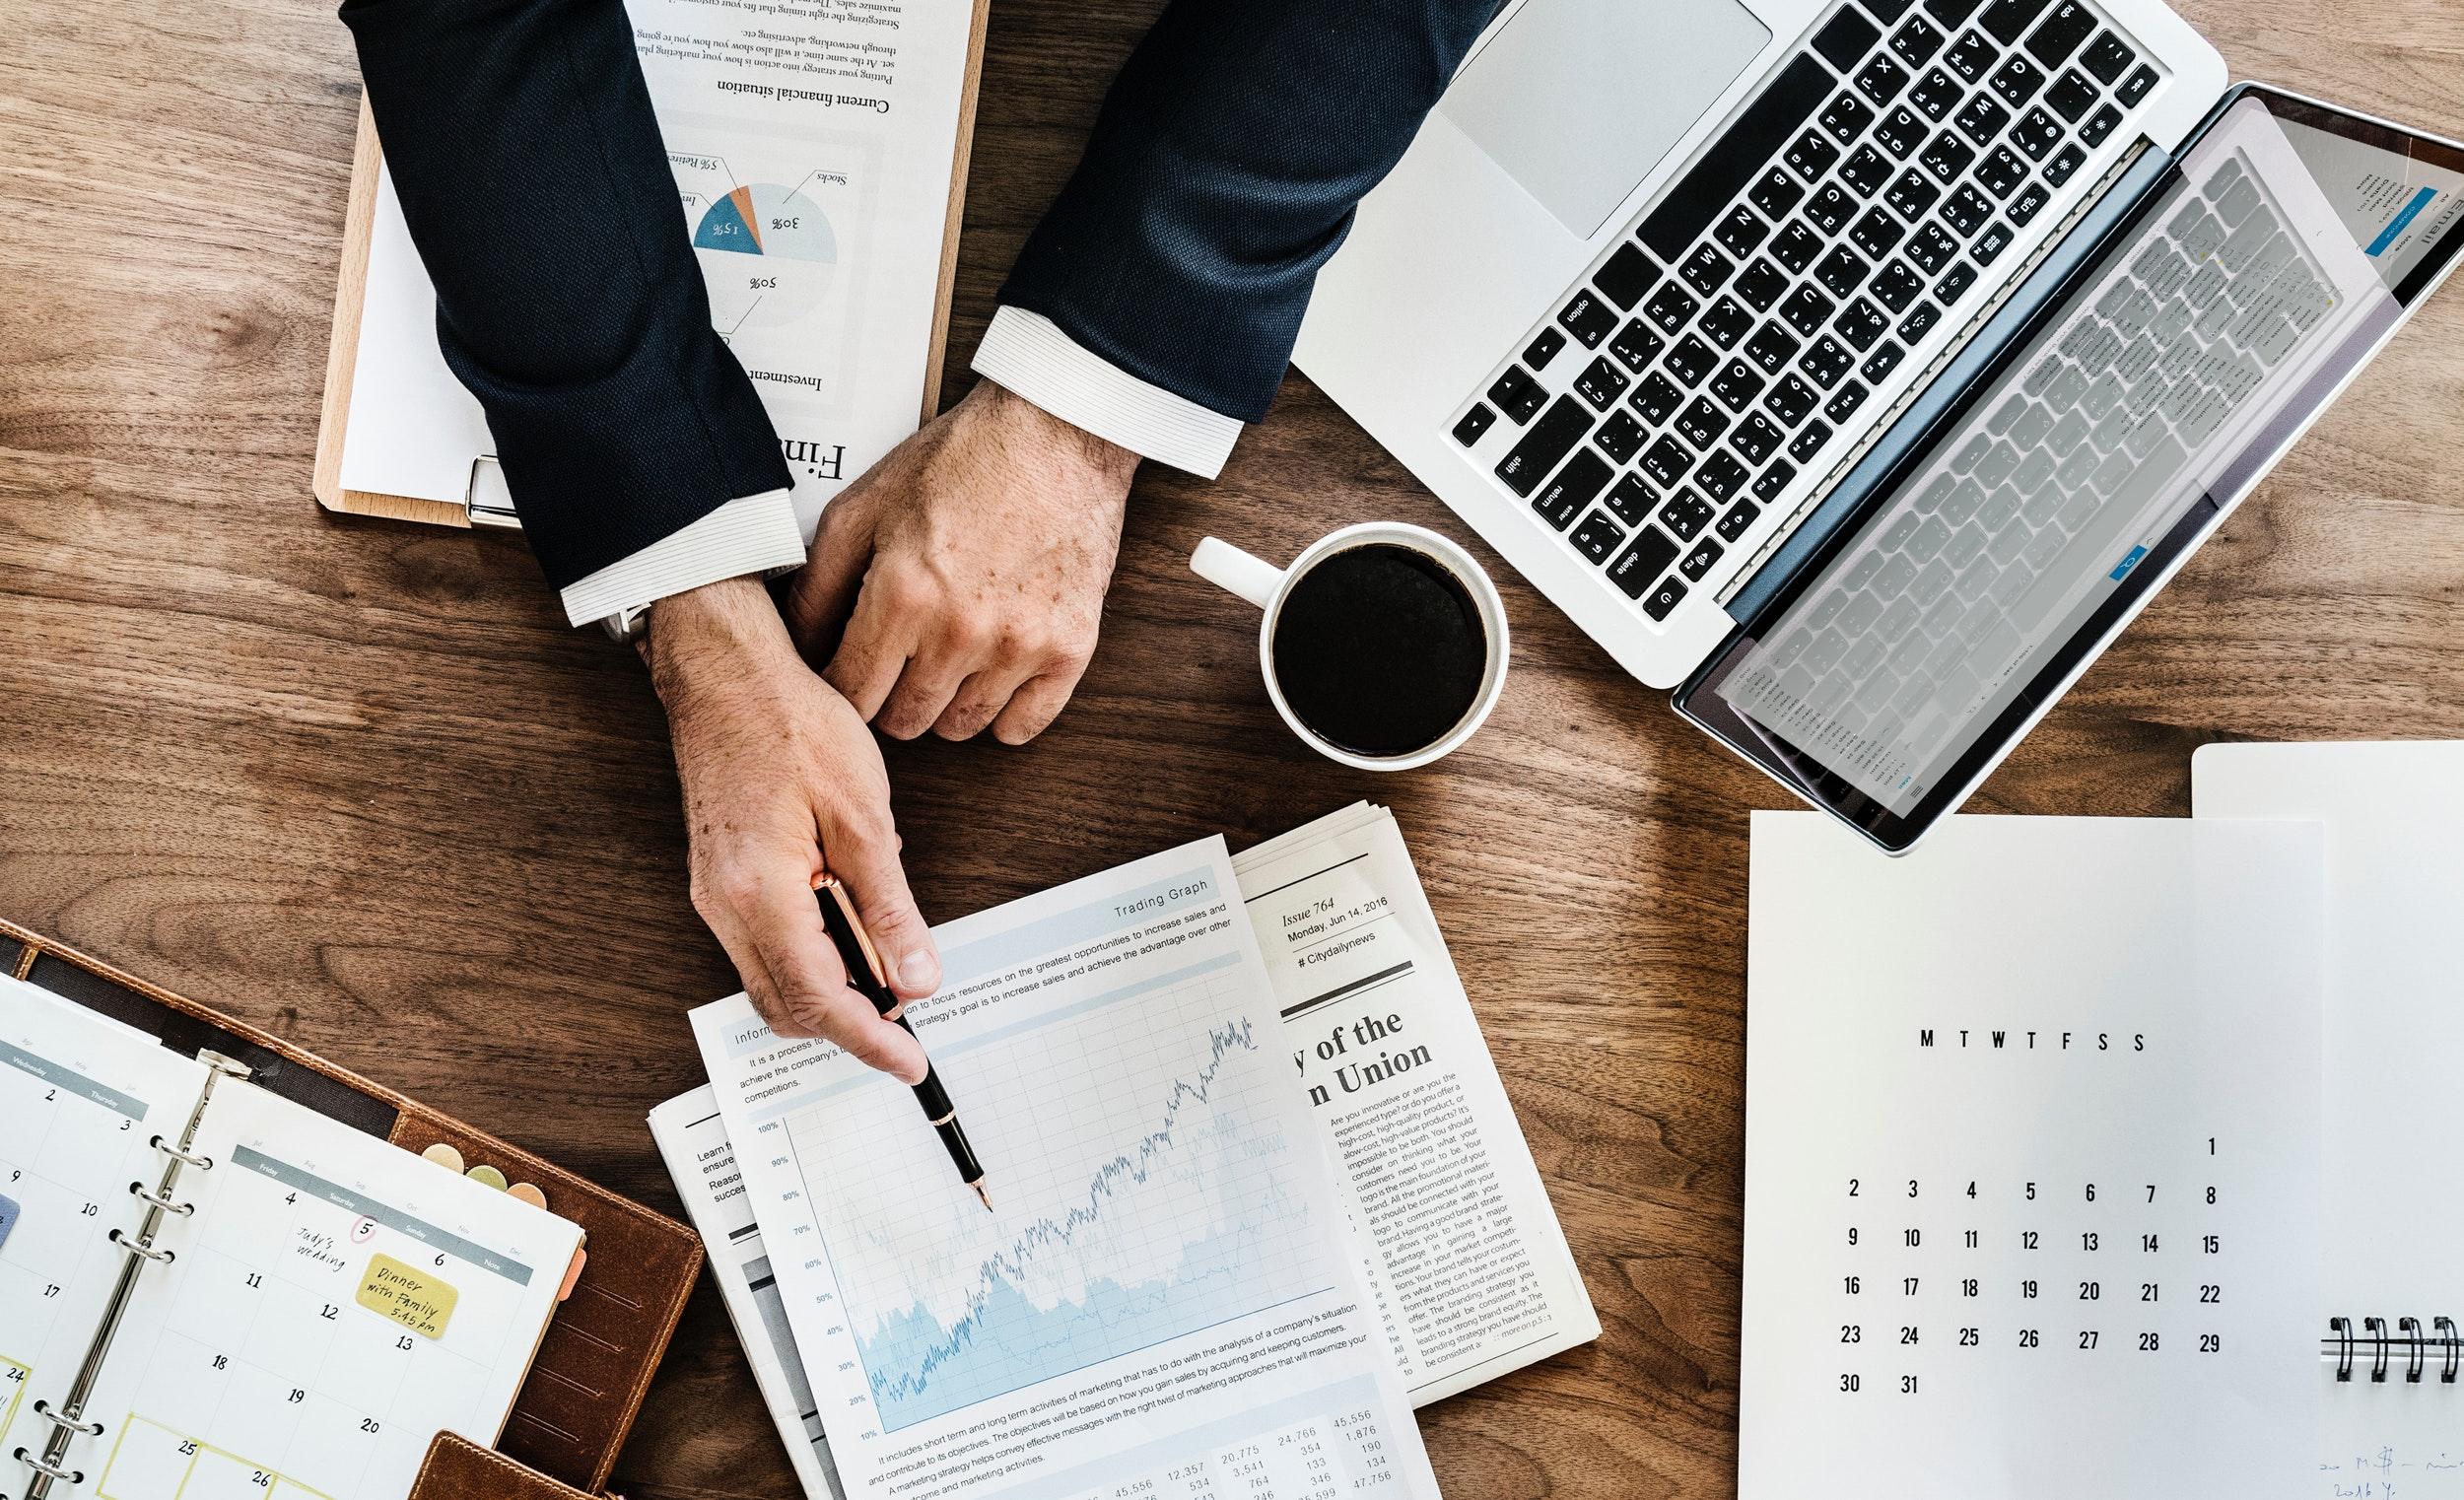 agenda-analysis-business-plan-990818-1